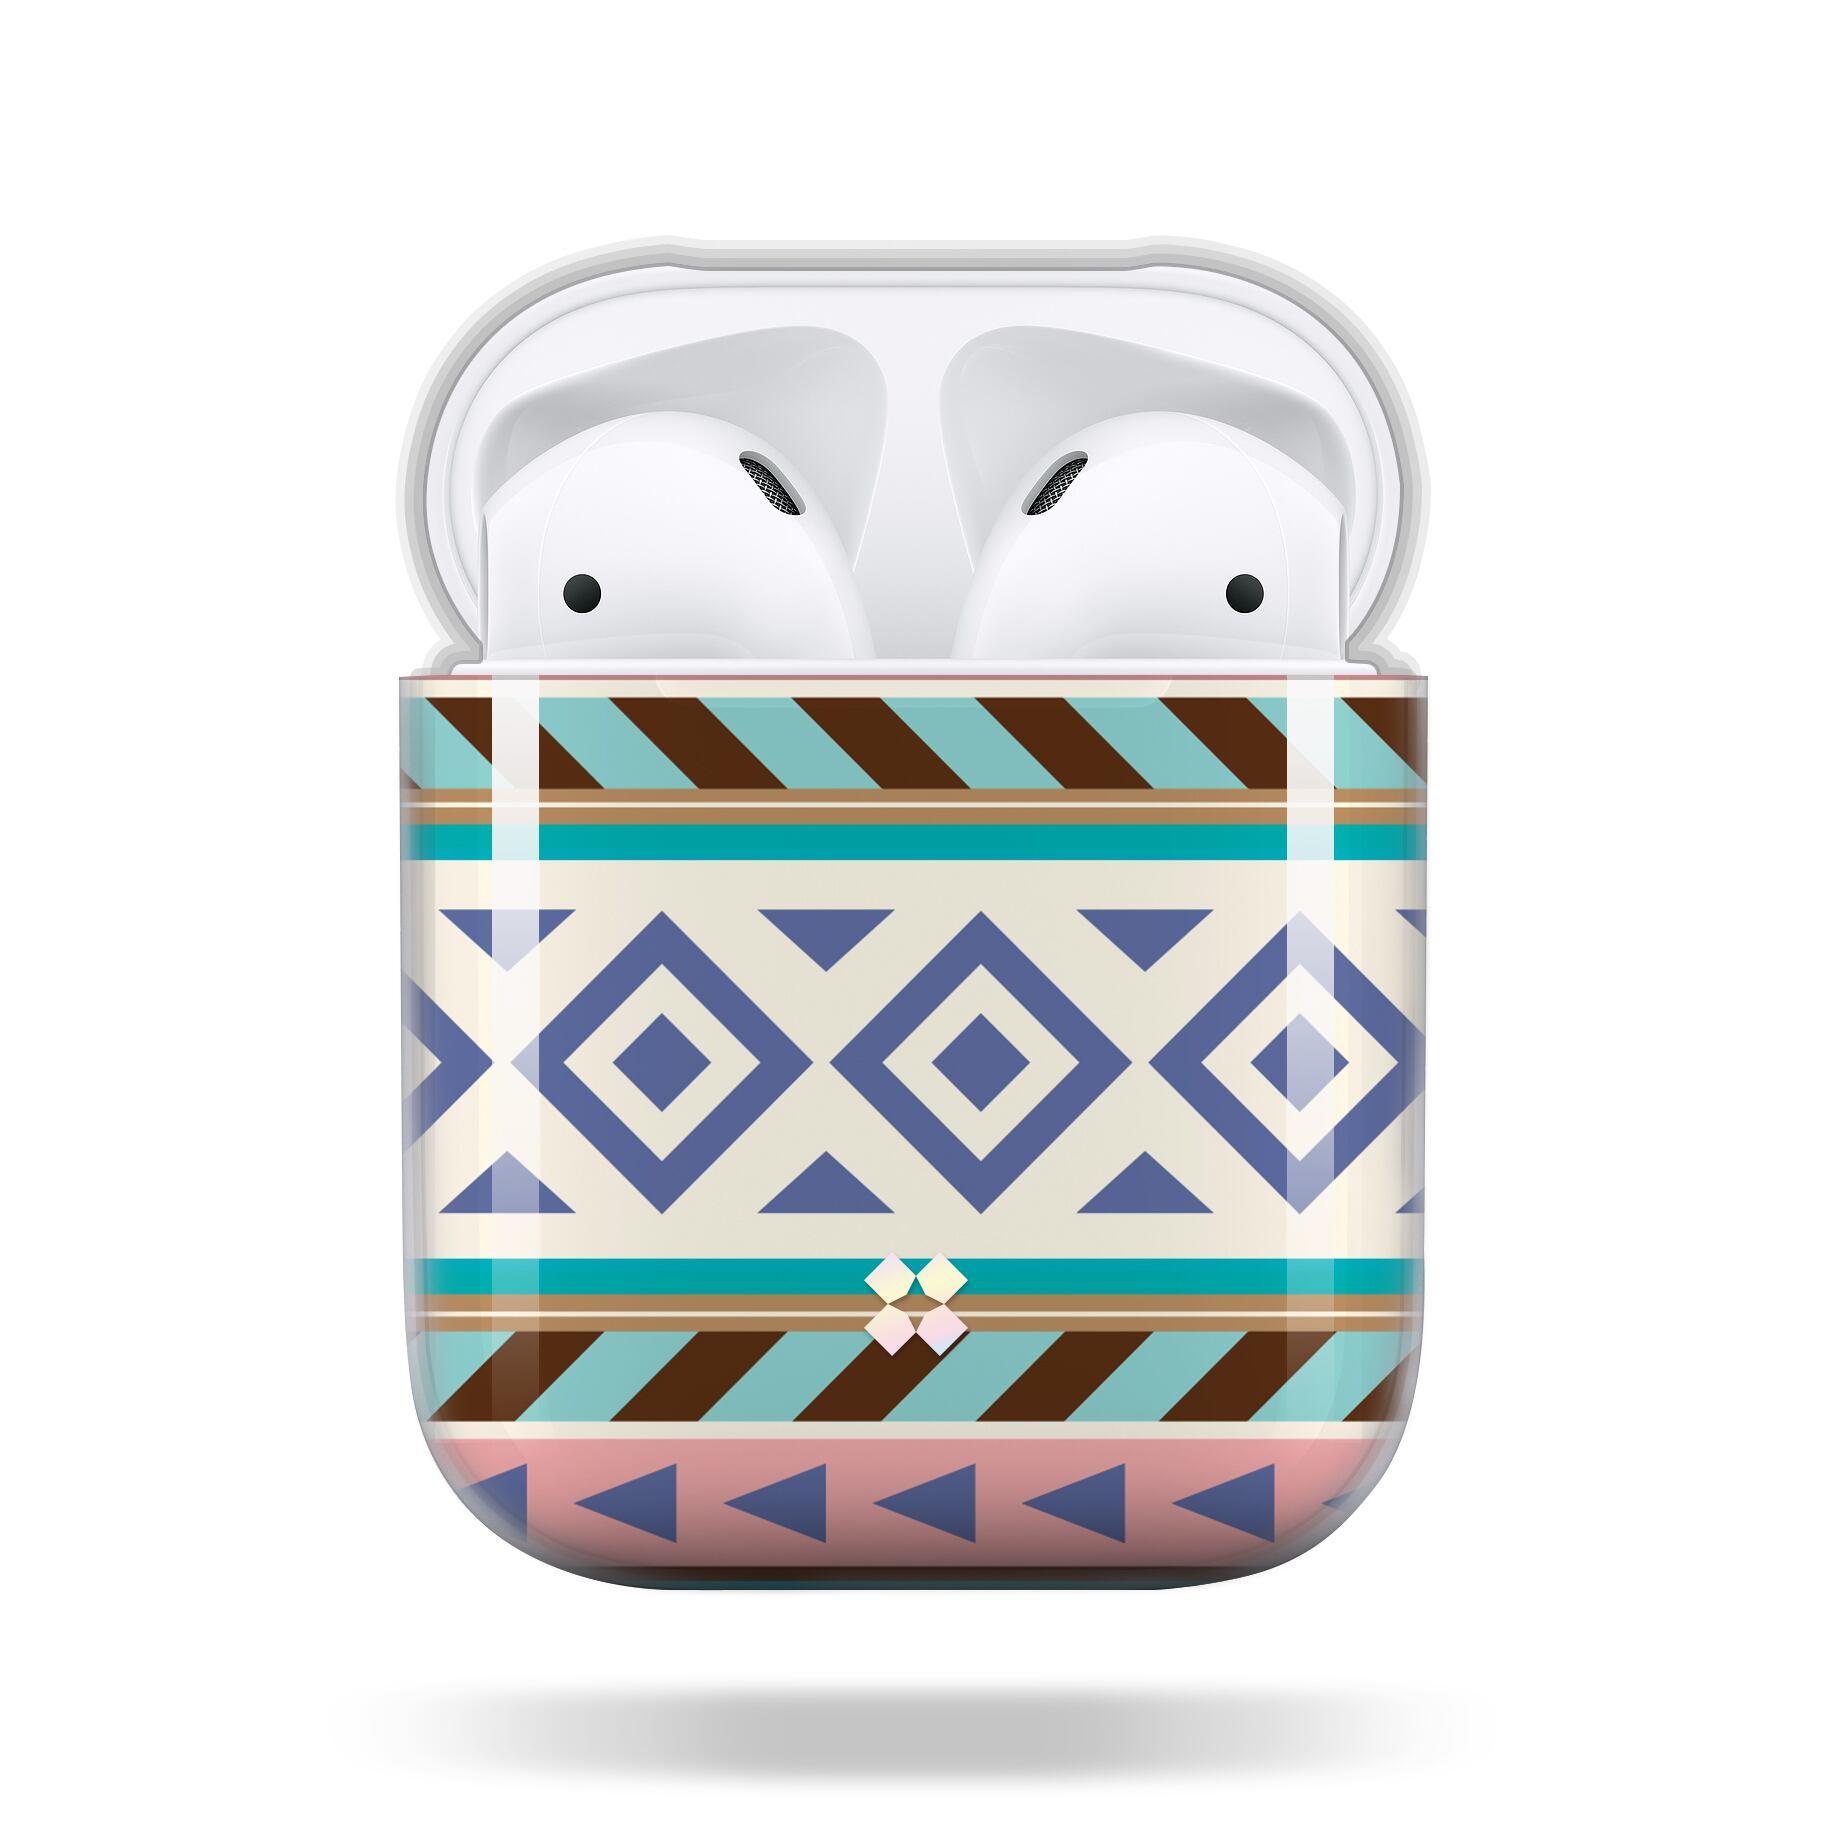 CaseStudi ケーススタディ PRISMART AirPods Case 2018 エアーポッズ ハード ケース 男女兼用 民族柄 ネイティブ Native 国内正規品